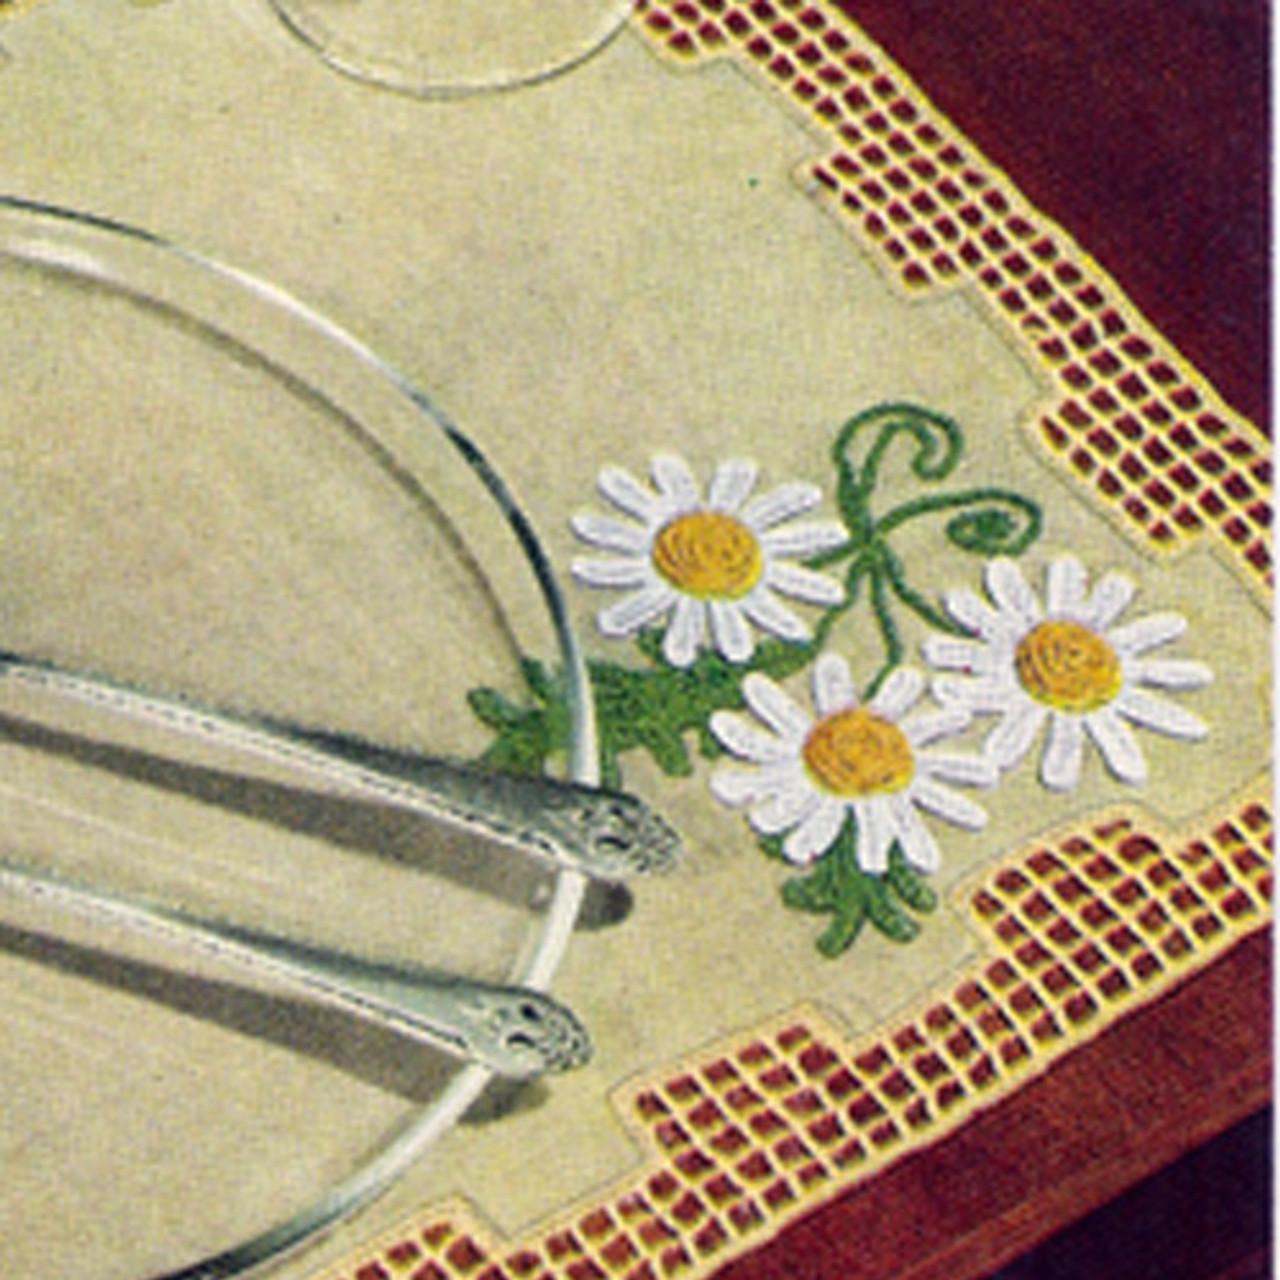 Linen Doily with Crochet Daisy edging Pattern